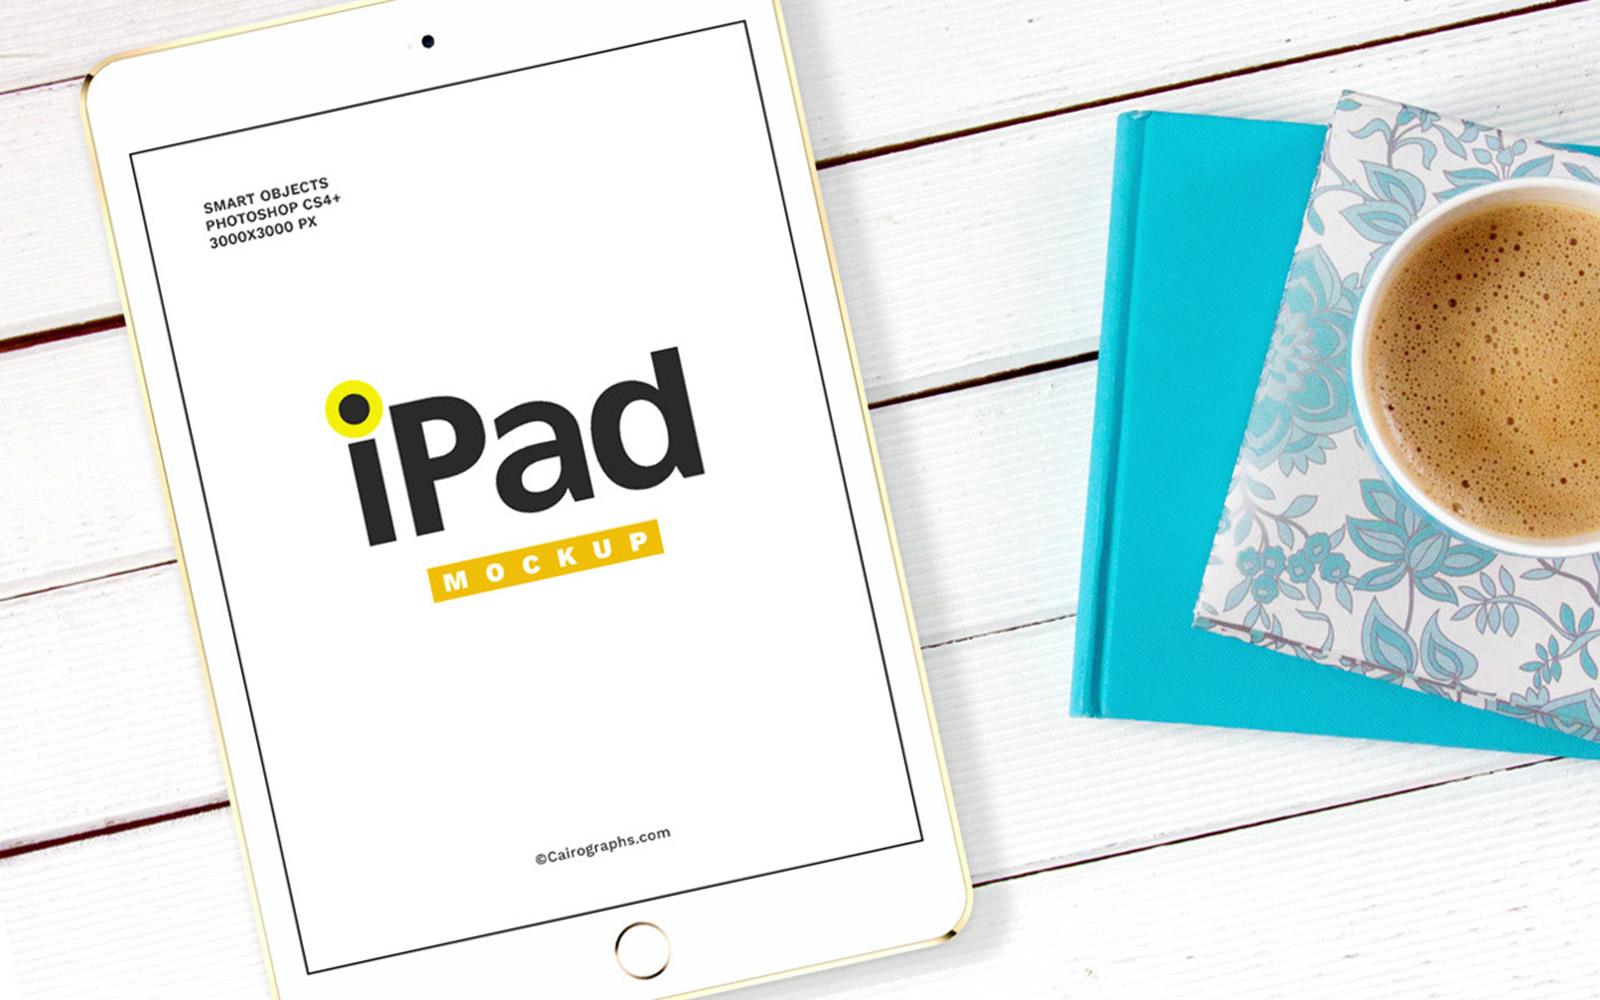 iPads Vol.2 Product Mockup